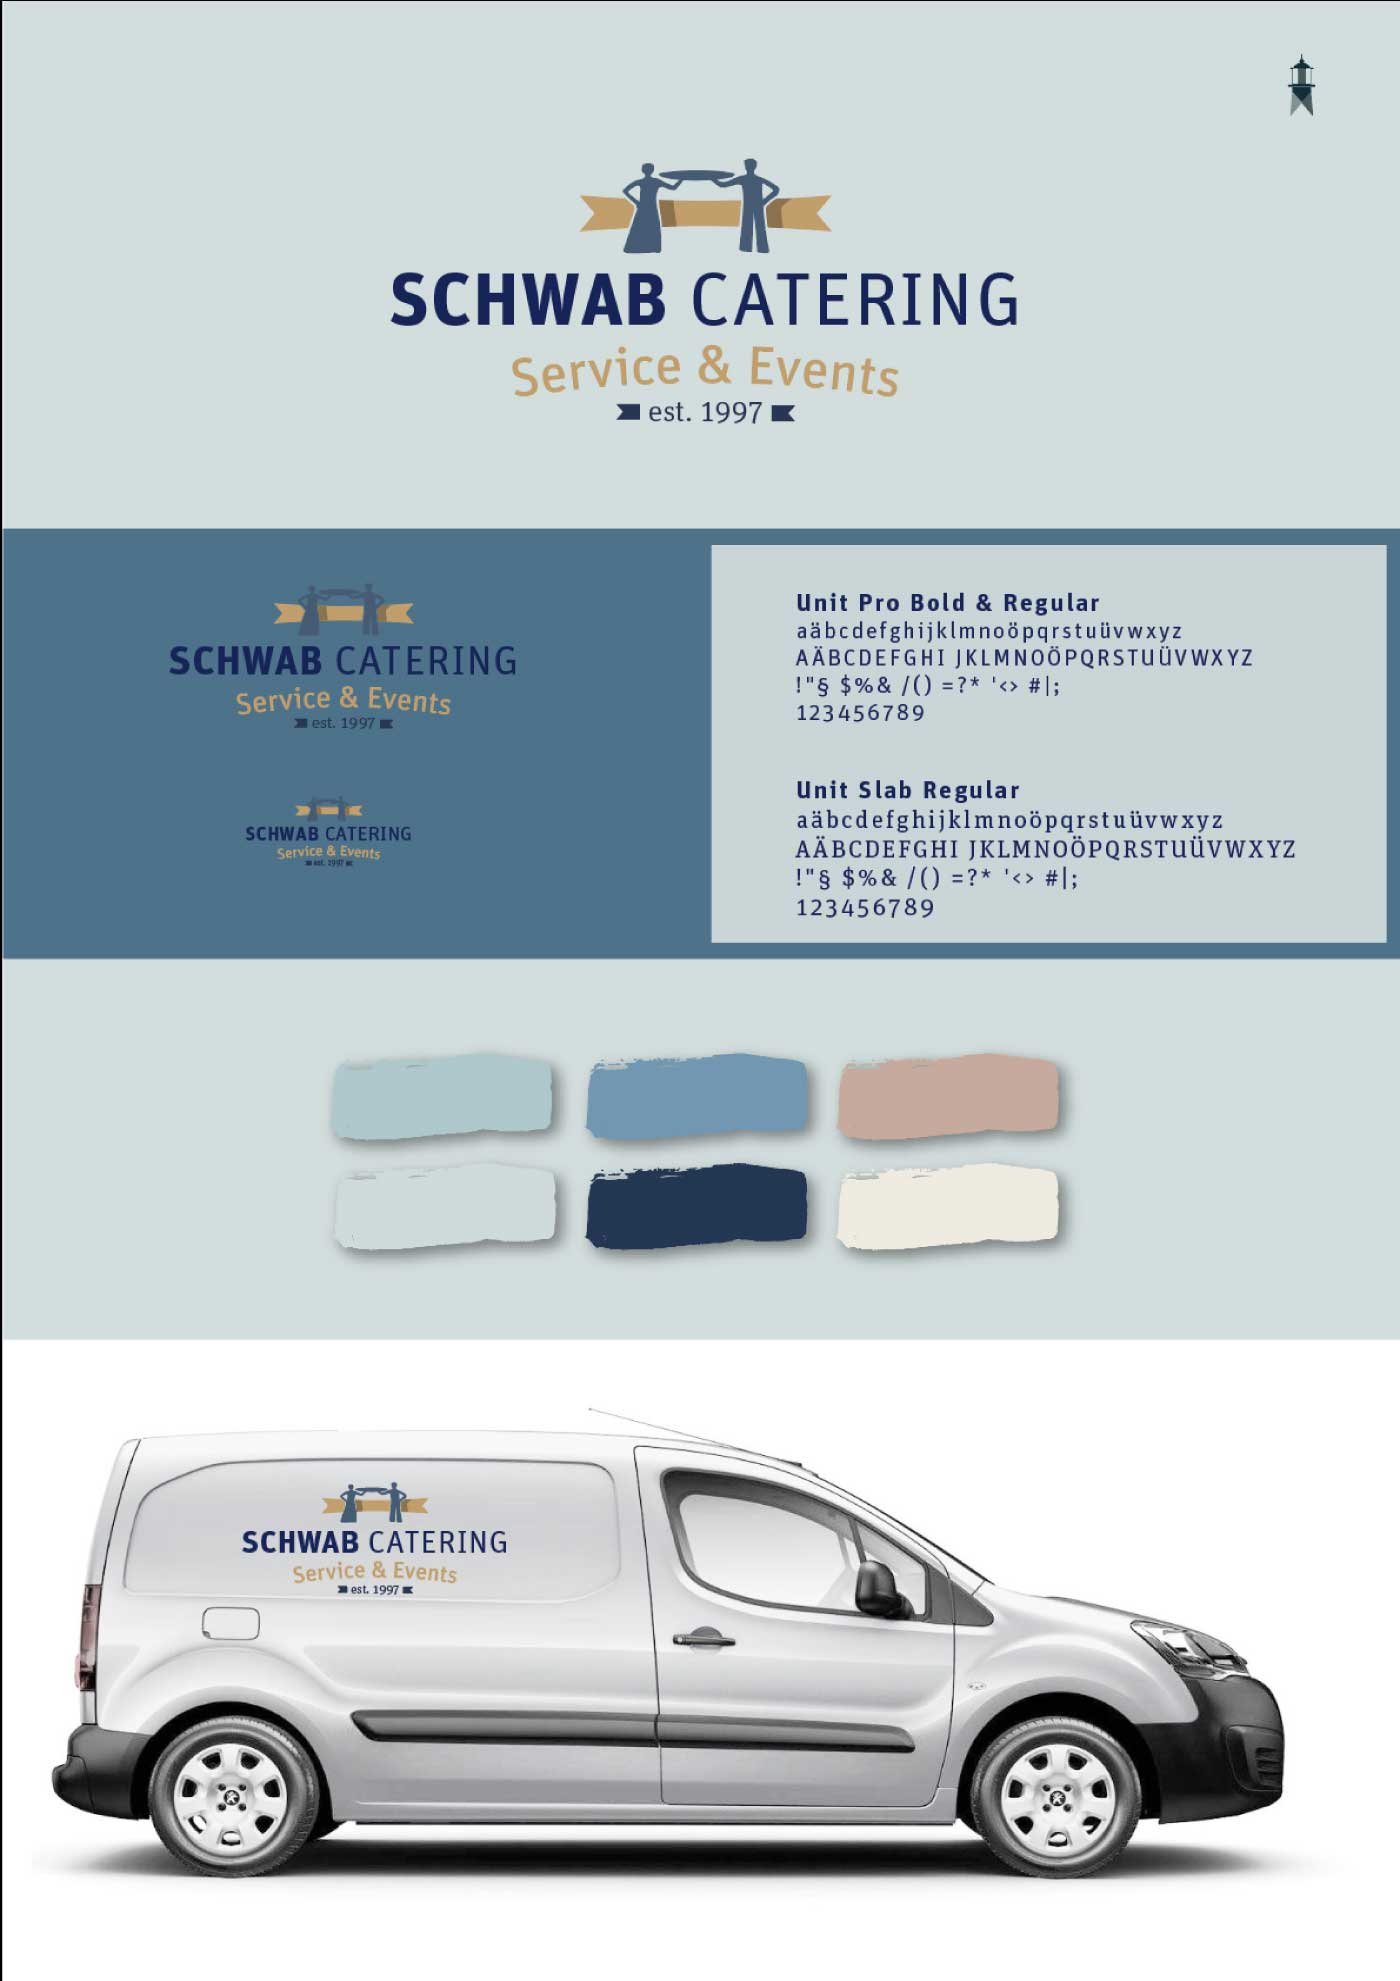 Corporate-Design-Schwab-Catering